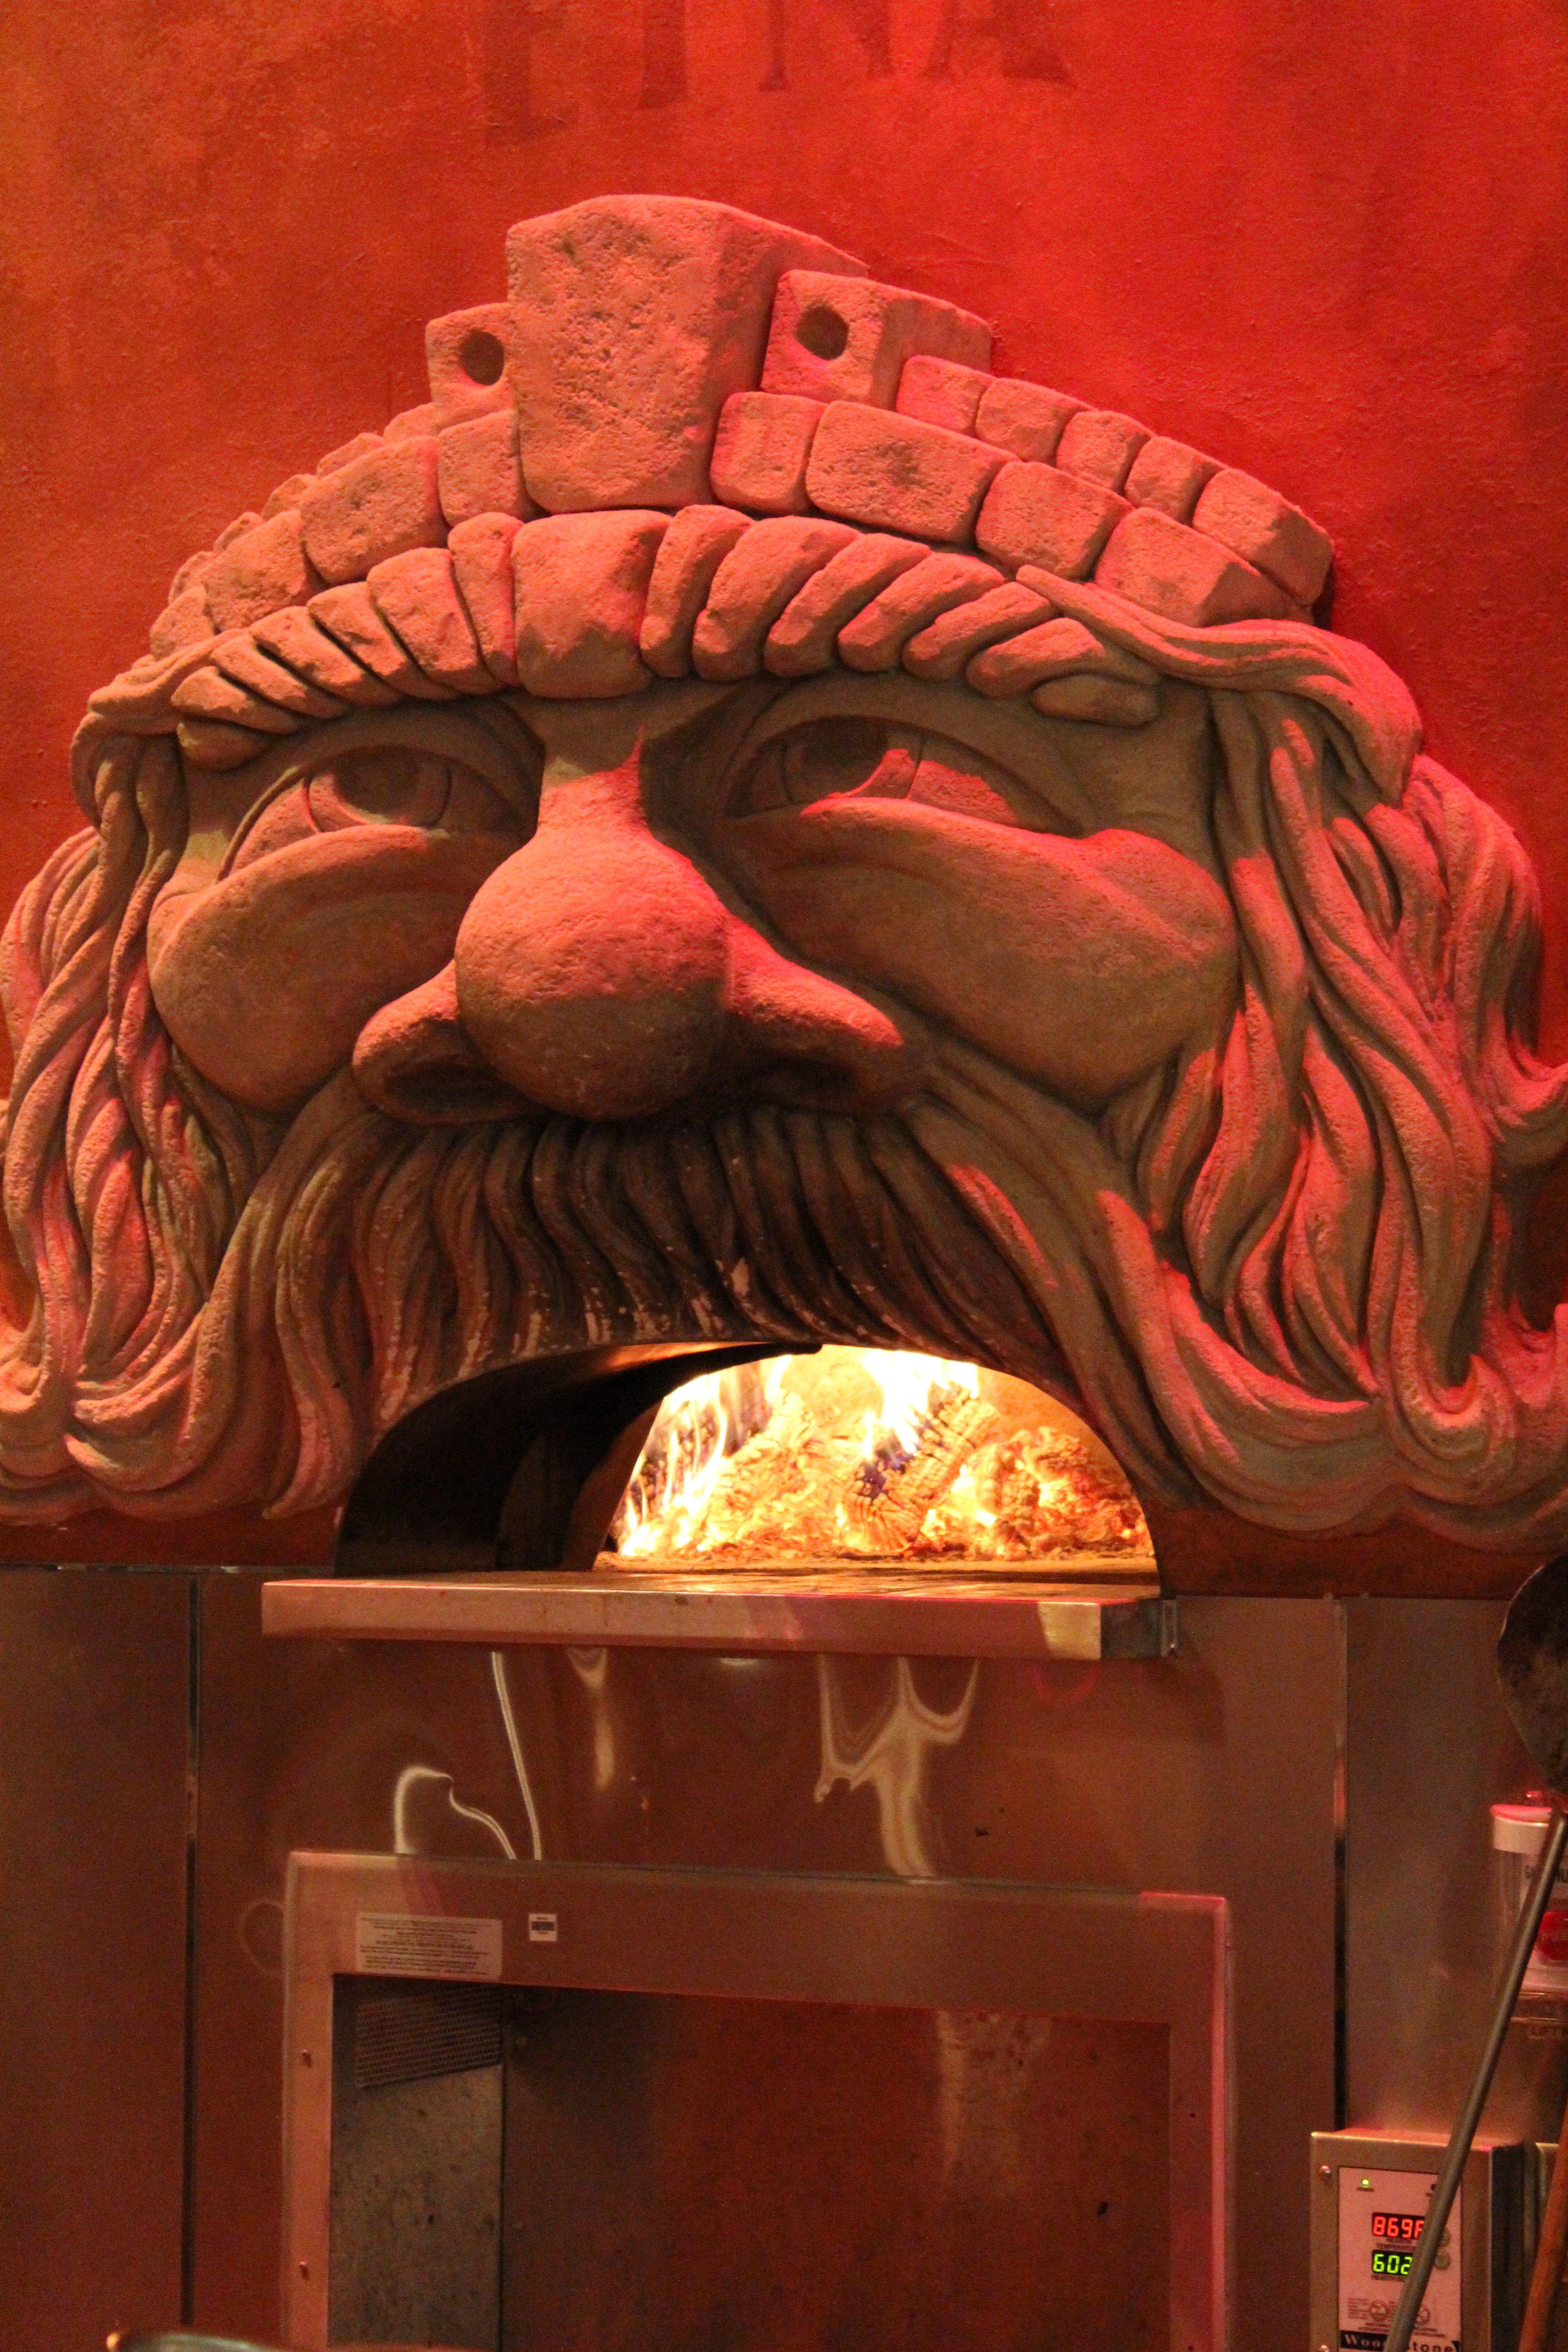 Pizza oven, Via Napoli, Epcot. AMAZING food! Abe & I loved it ...